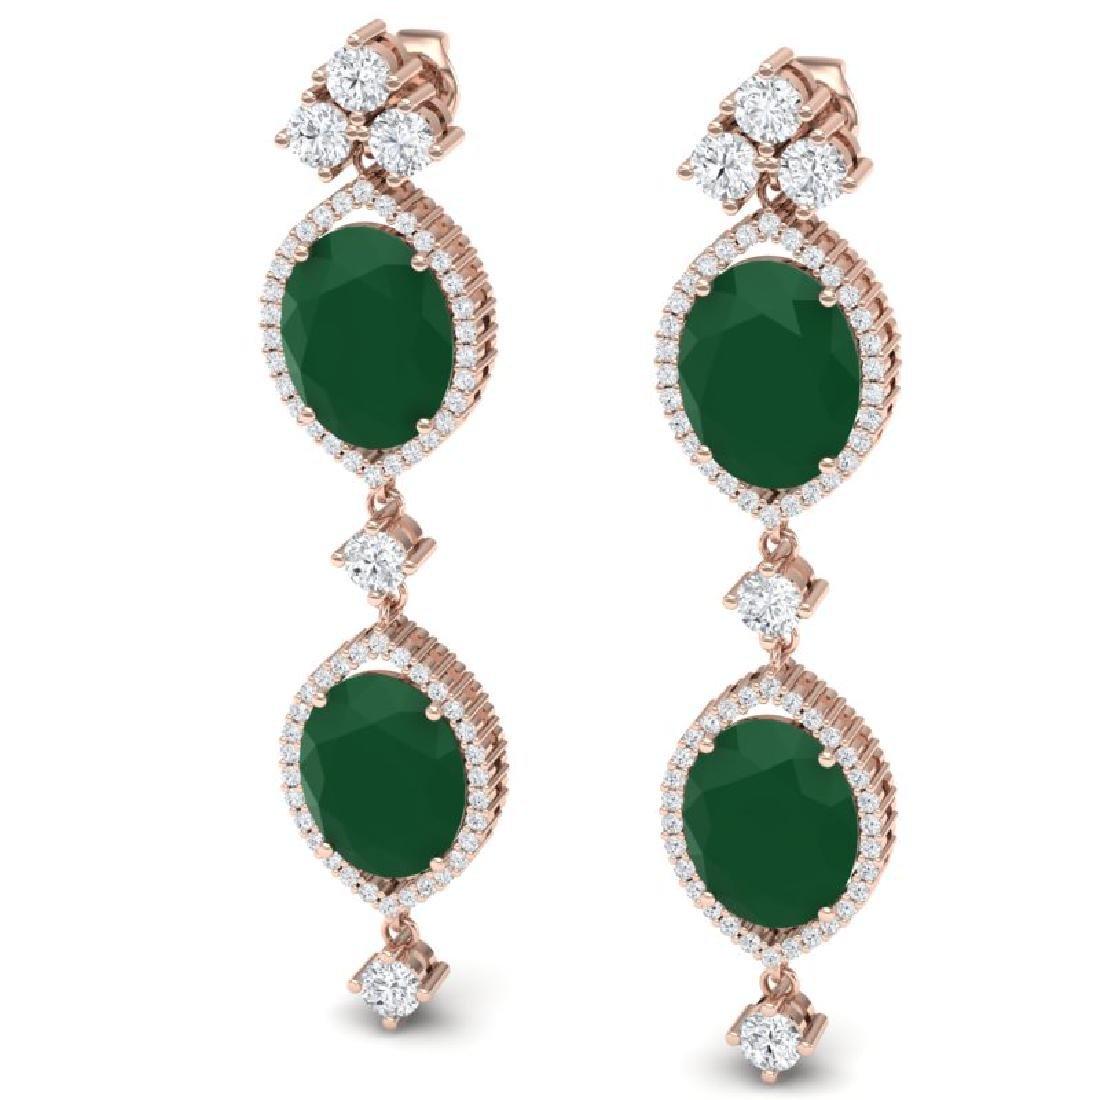 15.81 CTW Royalty Emerald & VS Diamond Earrings 18K - 2